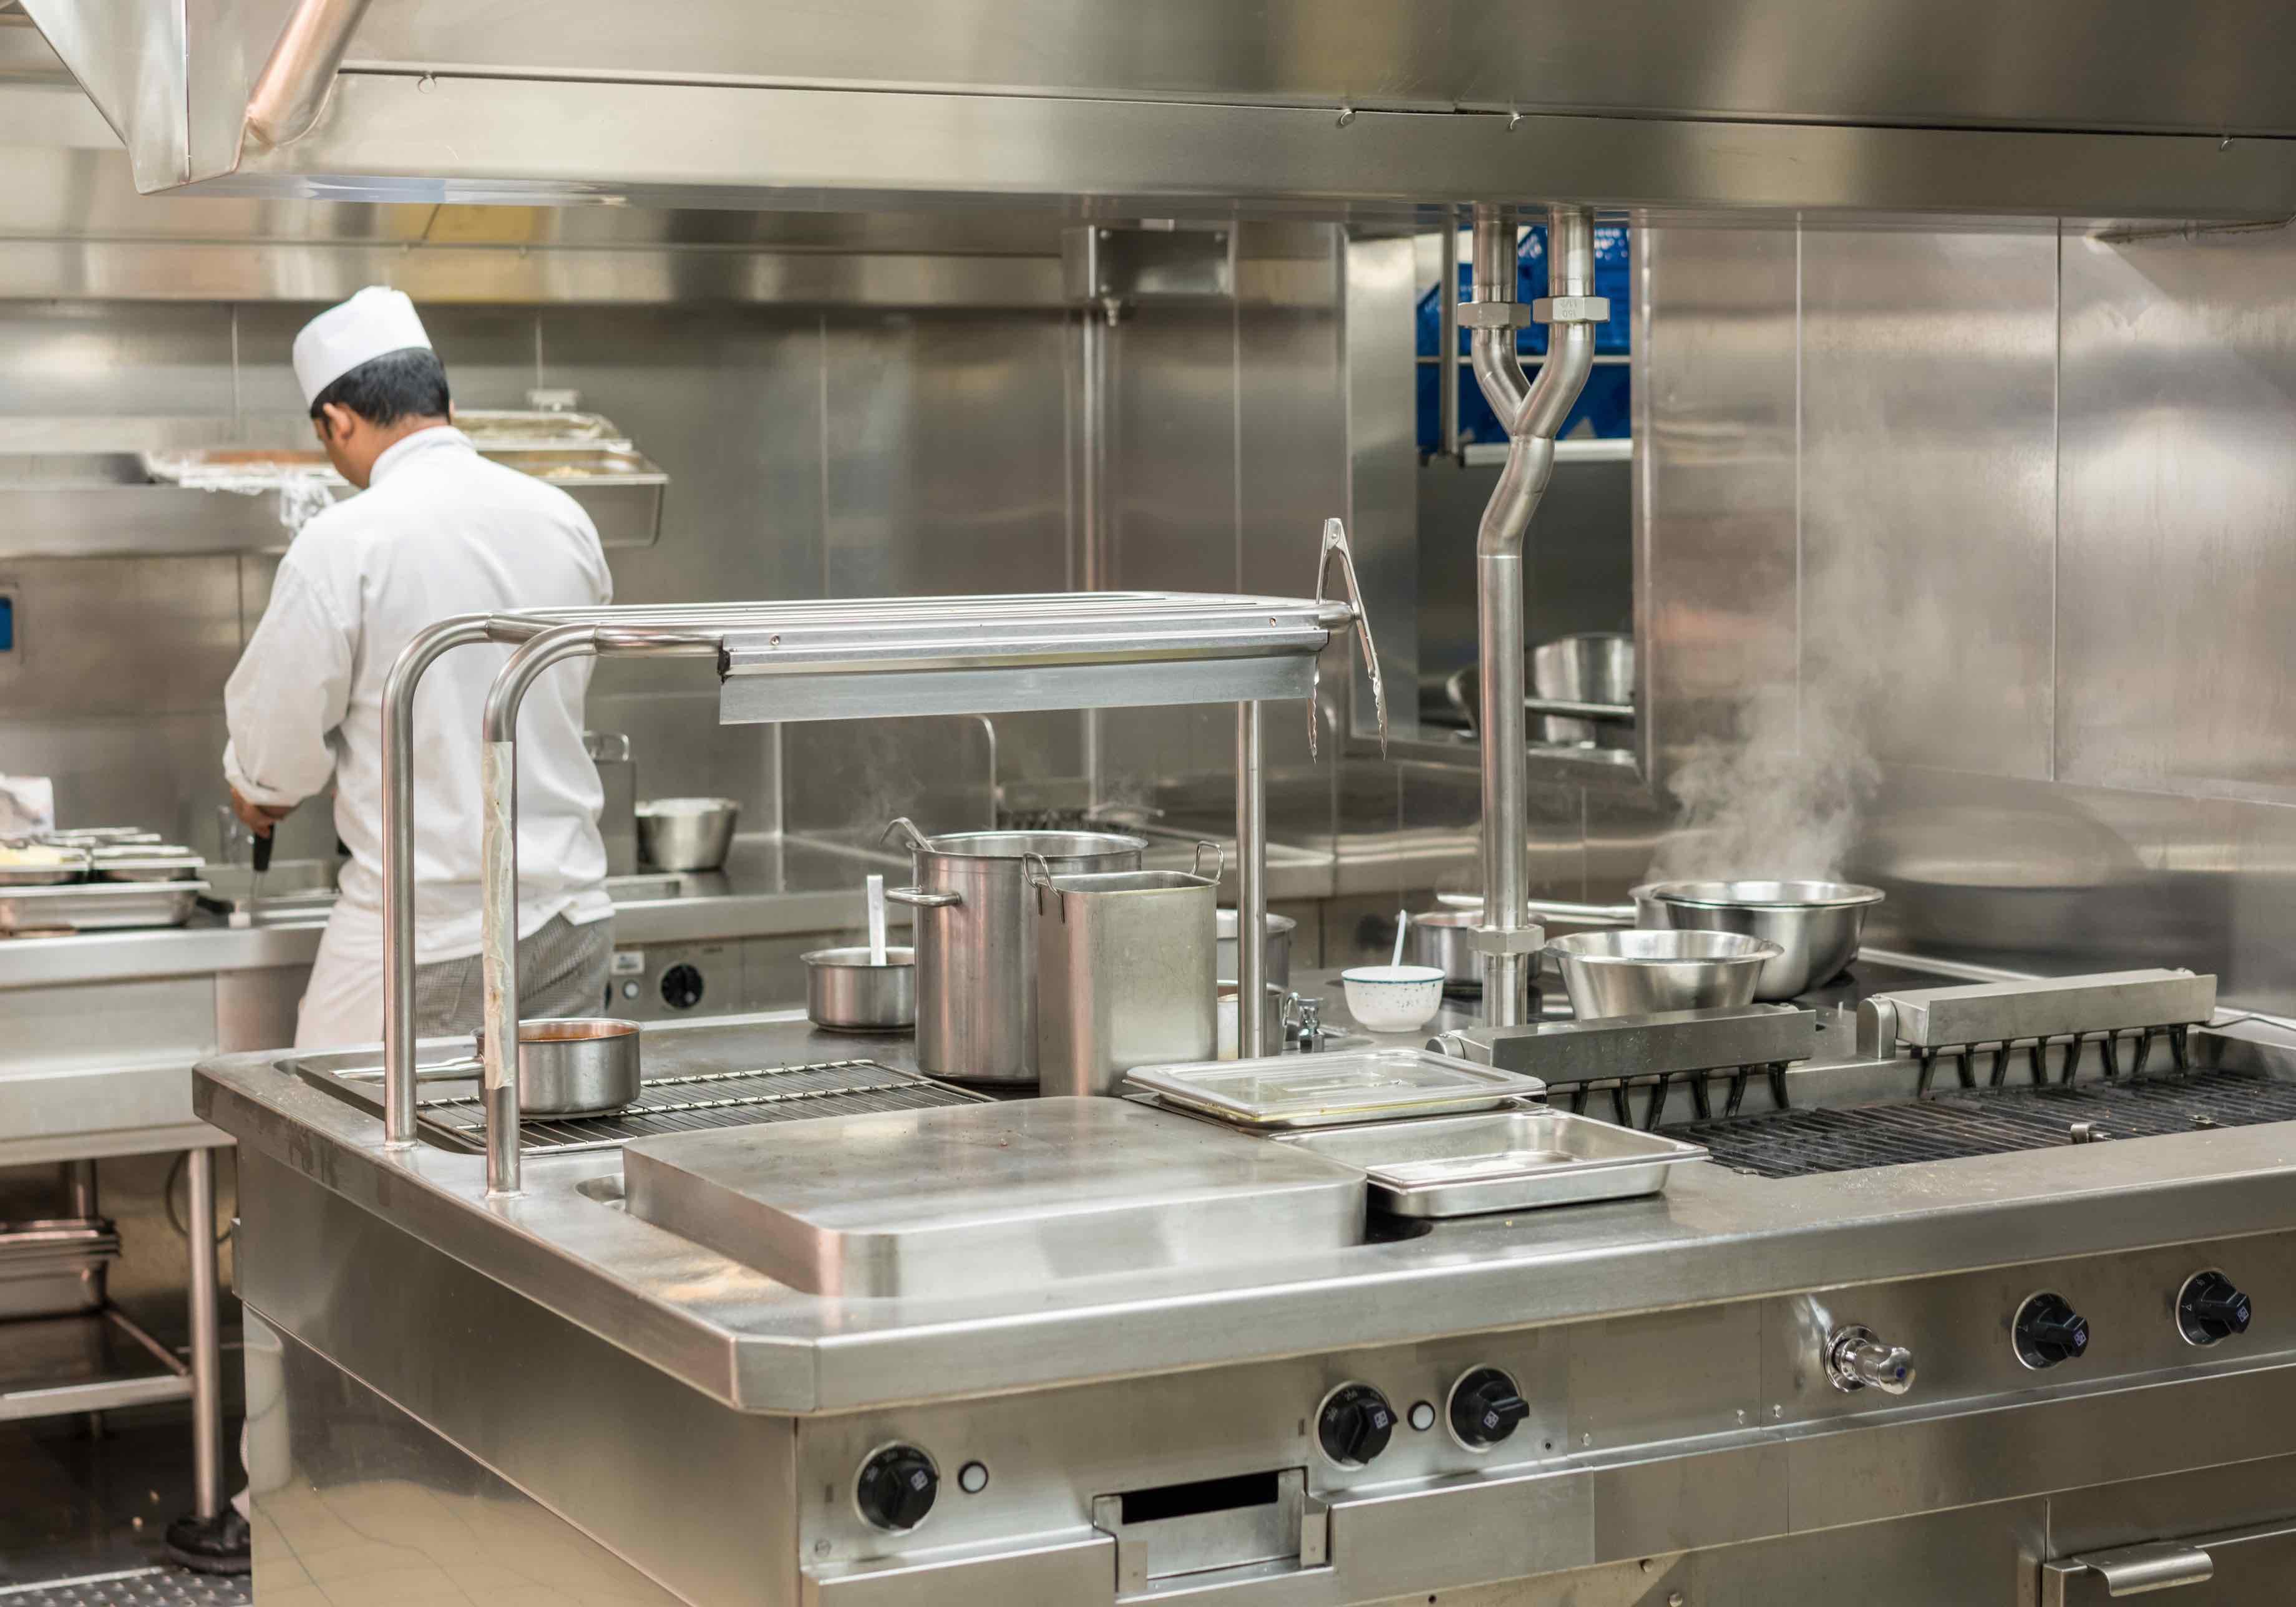 Kitchen Home With Restaurant Style Upgrades